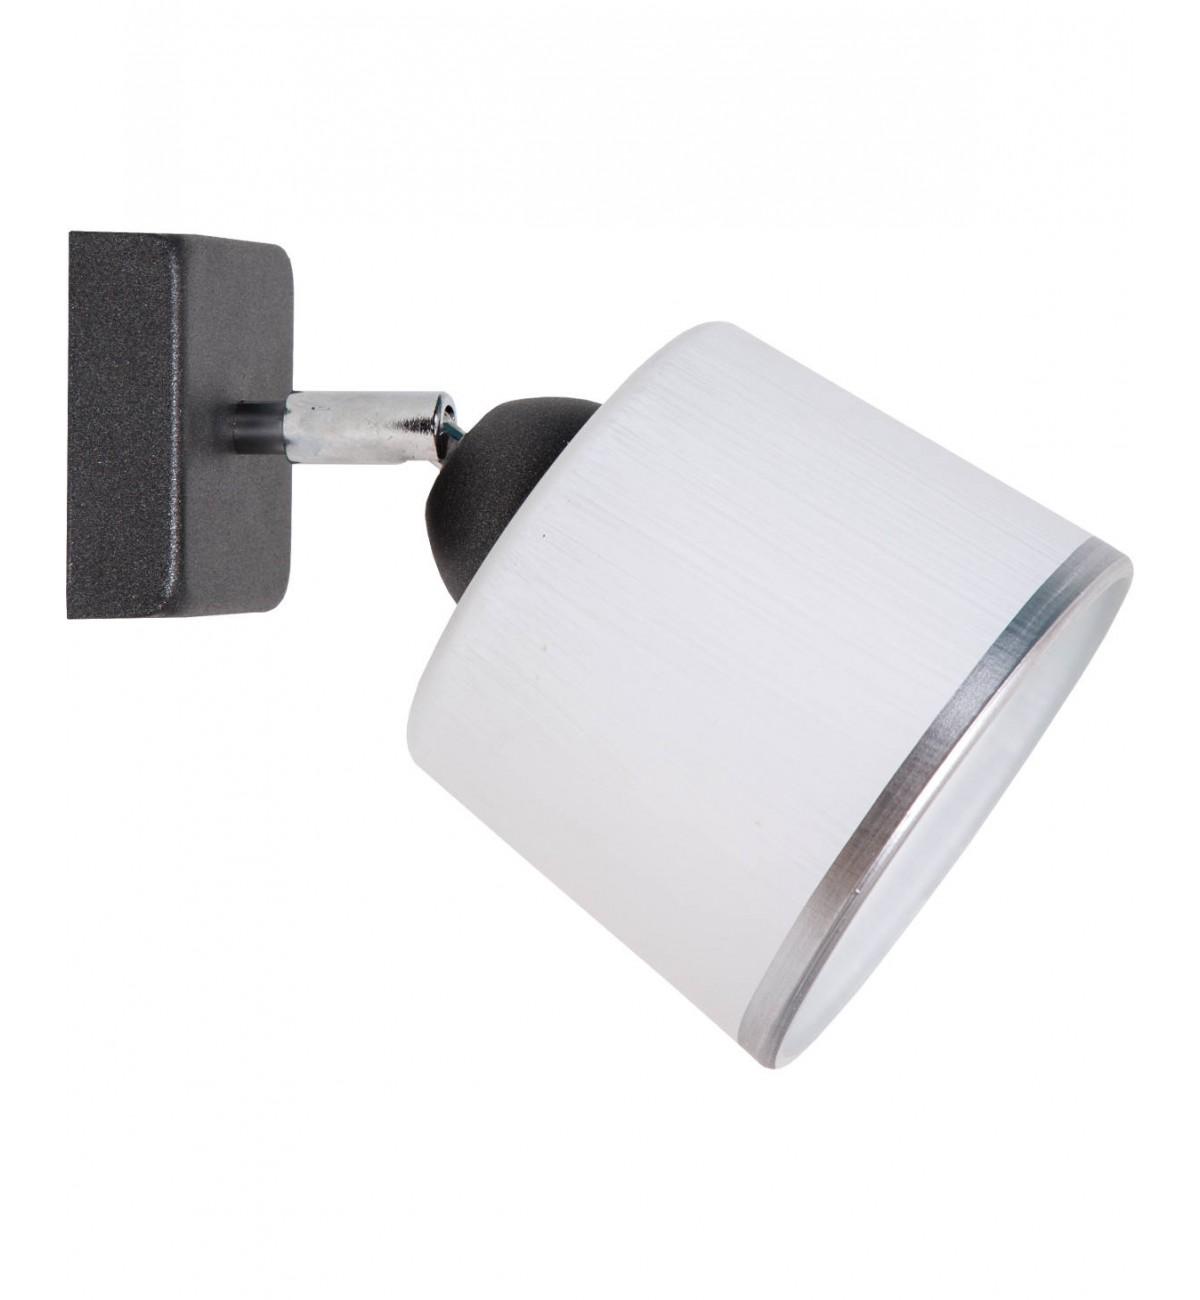 lampa kinkiet sufitowa wiszaca plafon Kinkiety do sypialni